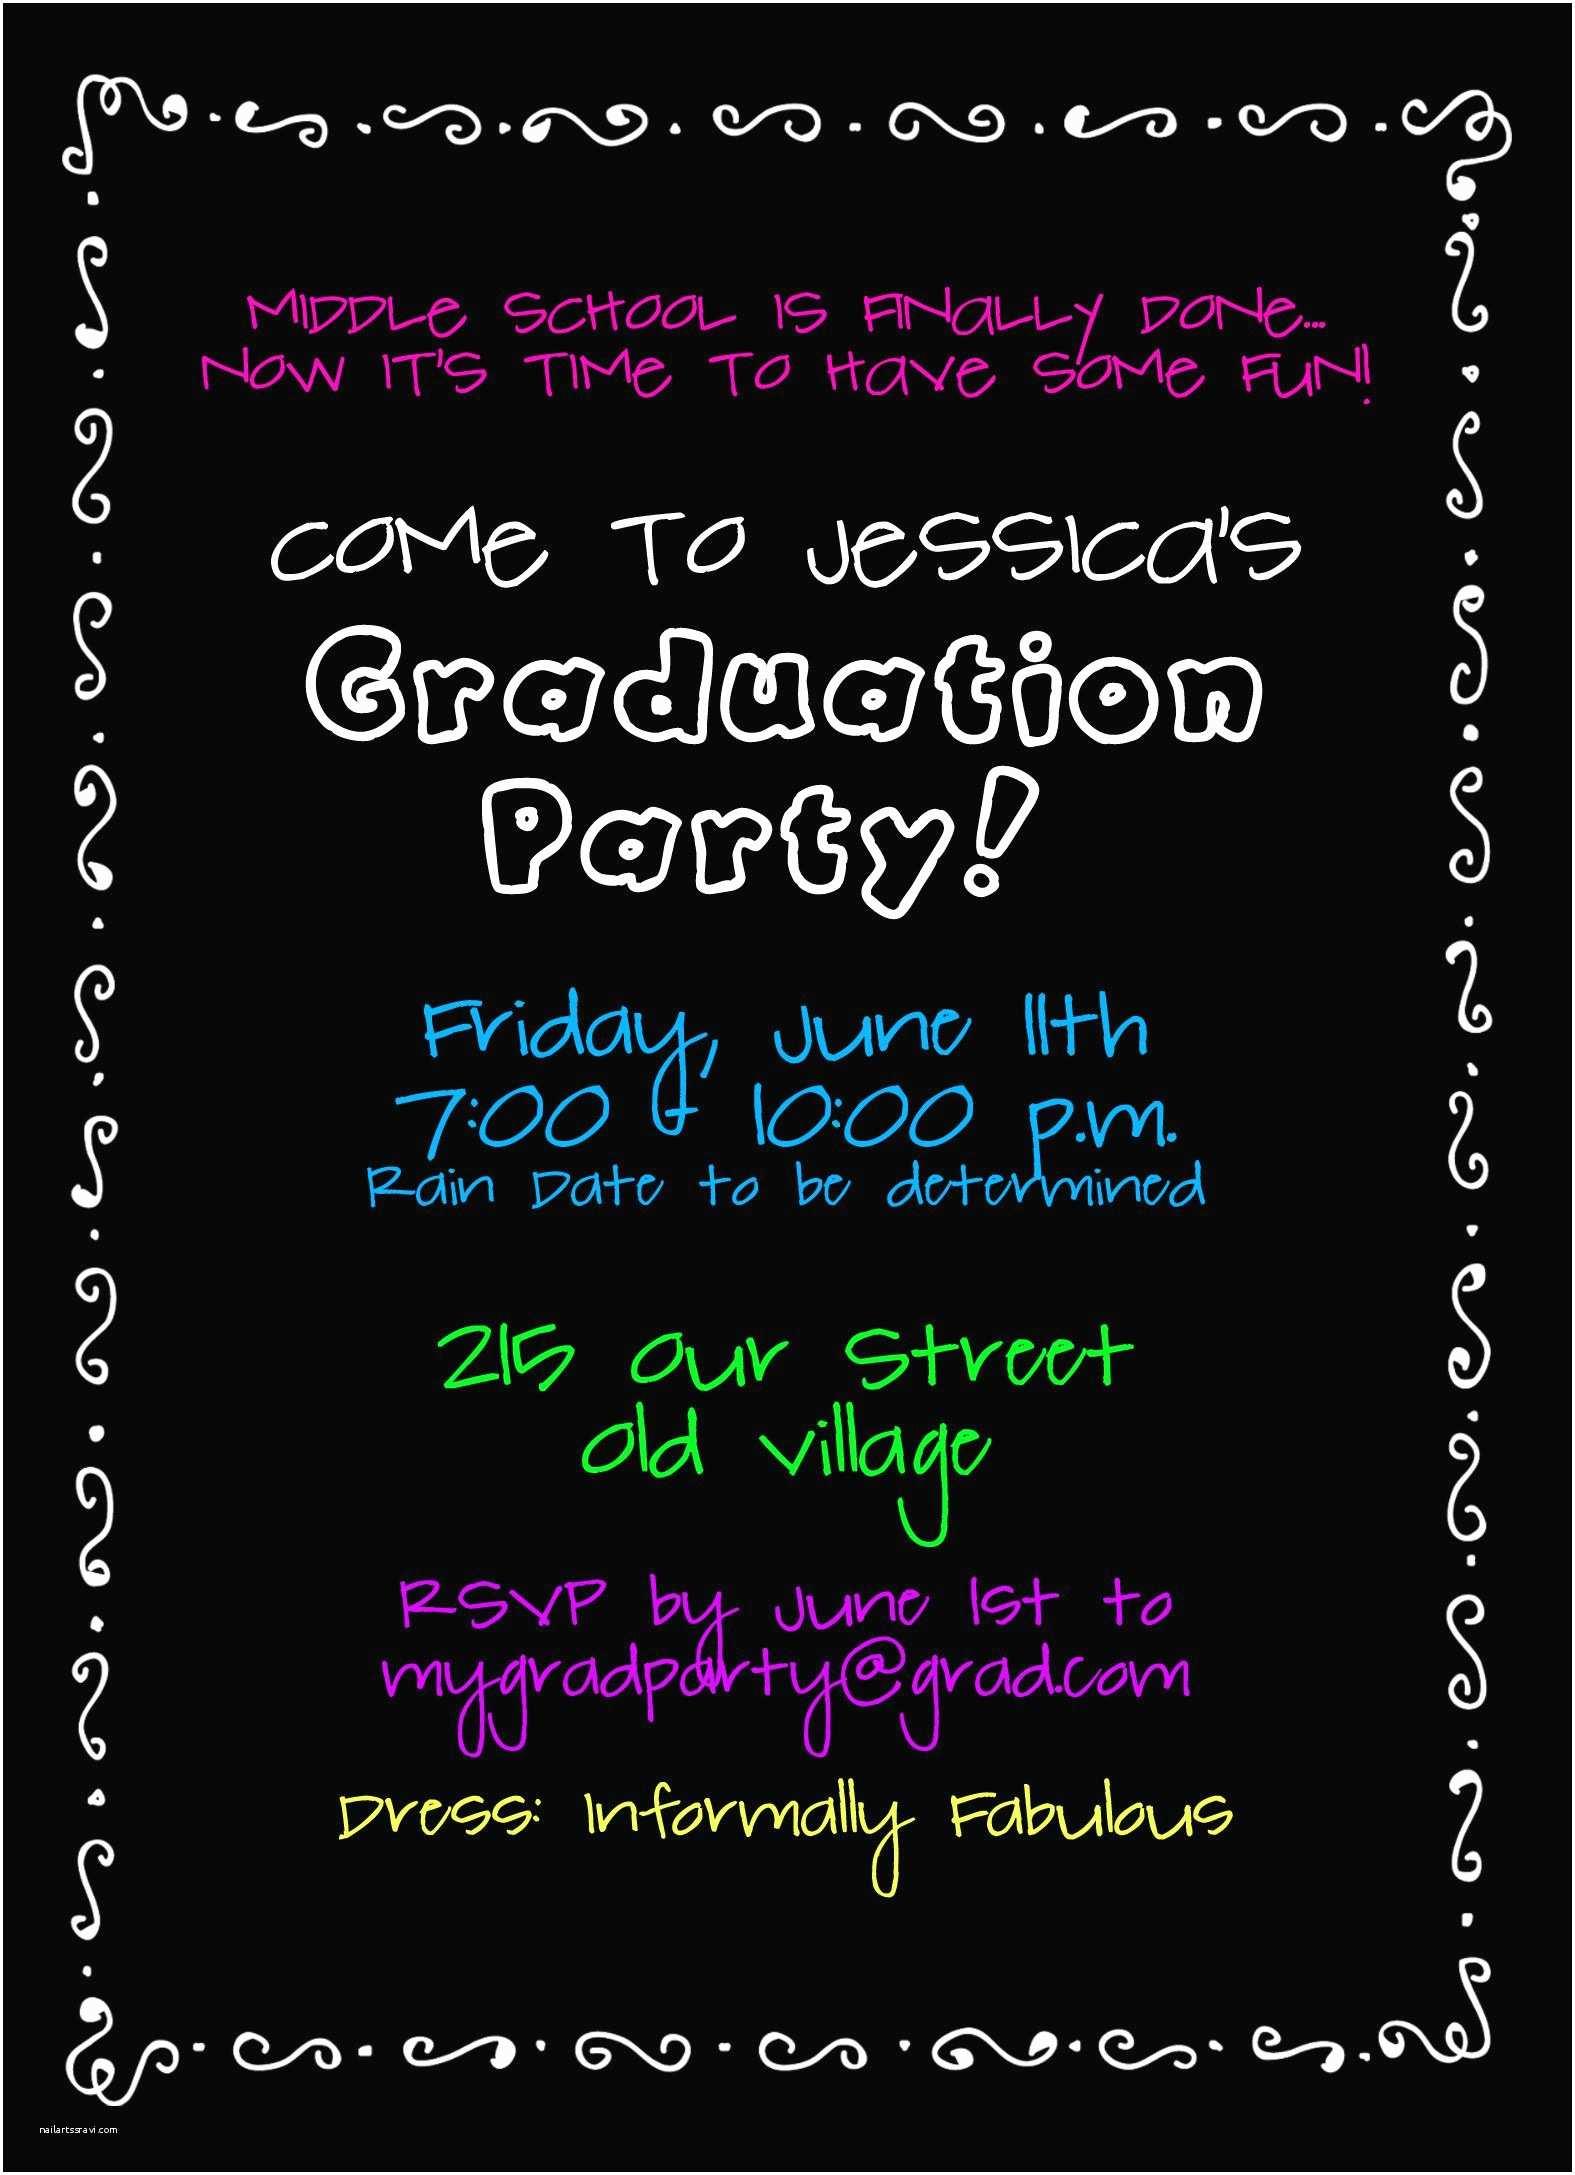 Graduation Party Invitations Wording Graduation Party Invites